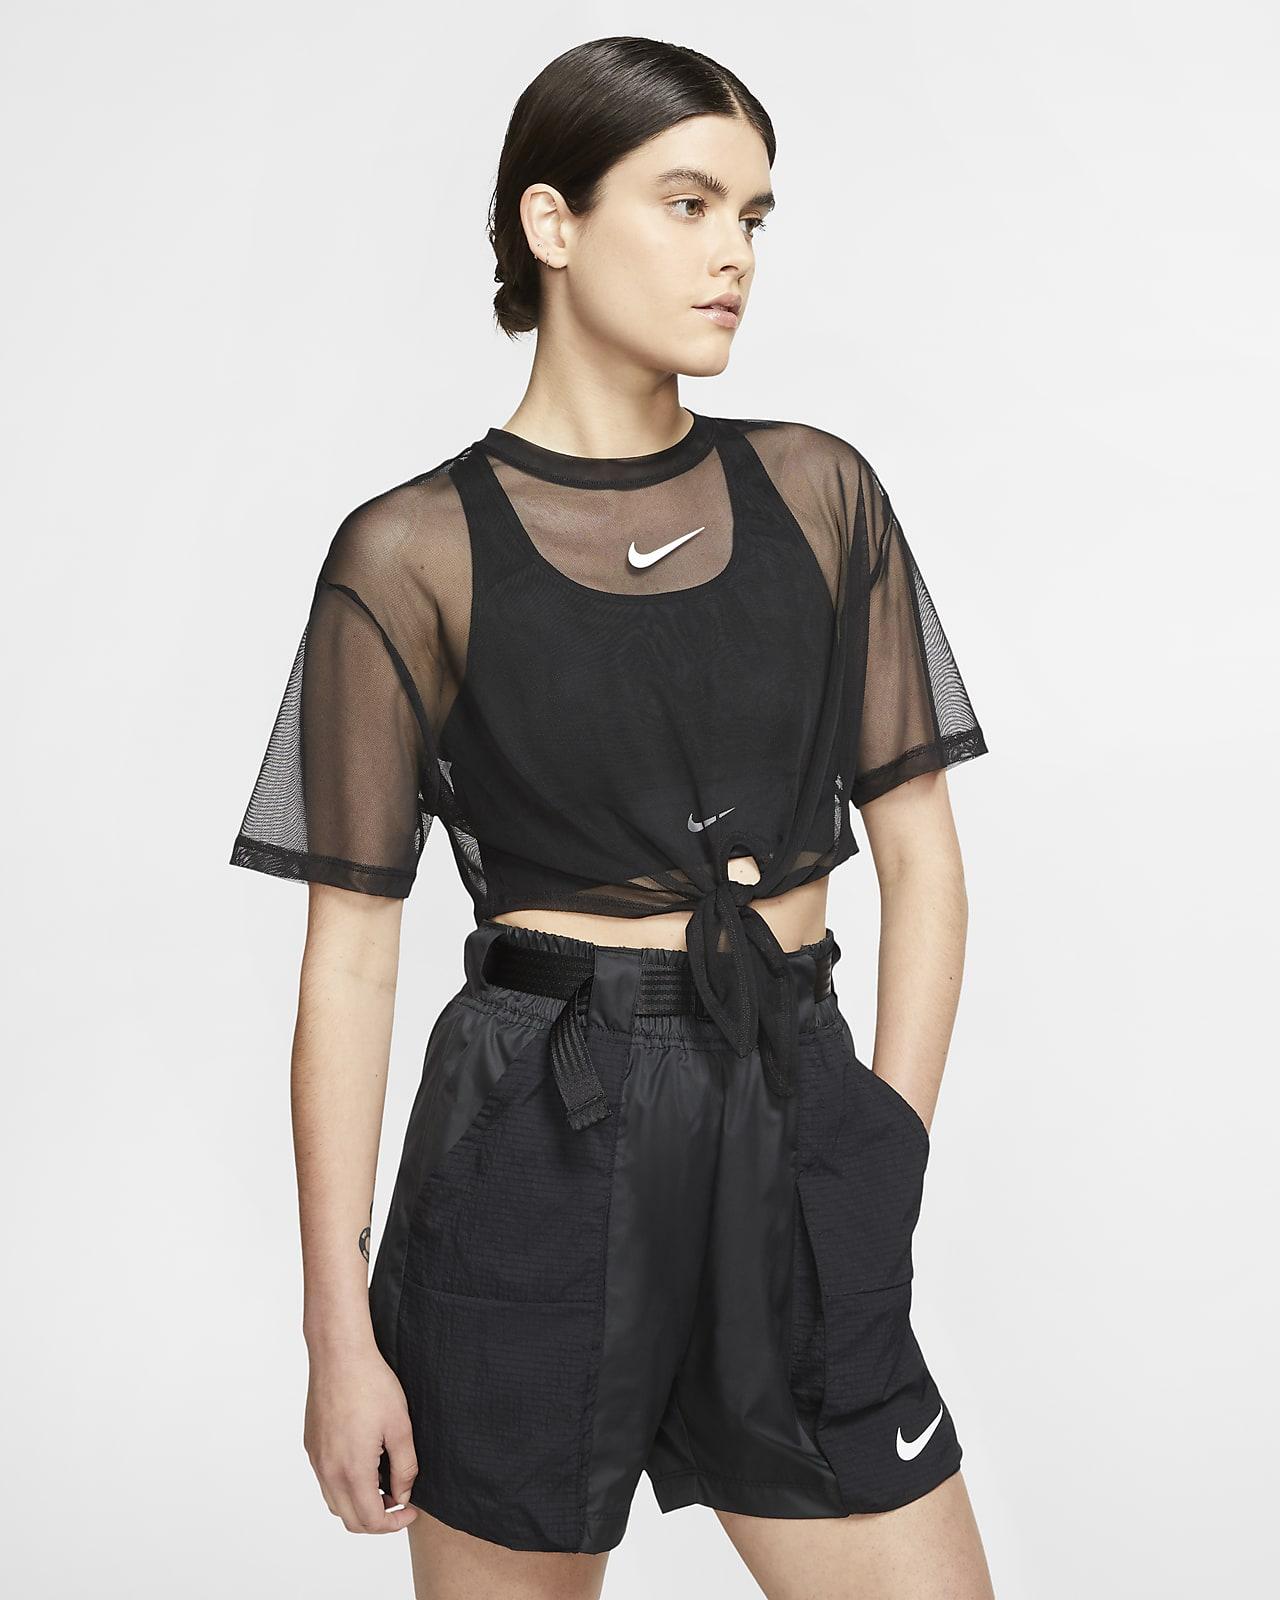 Camisola de manga curta Nike Sportswear para mulher